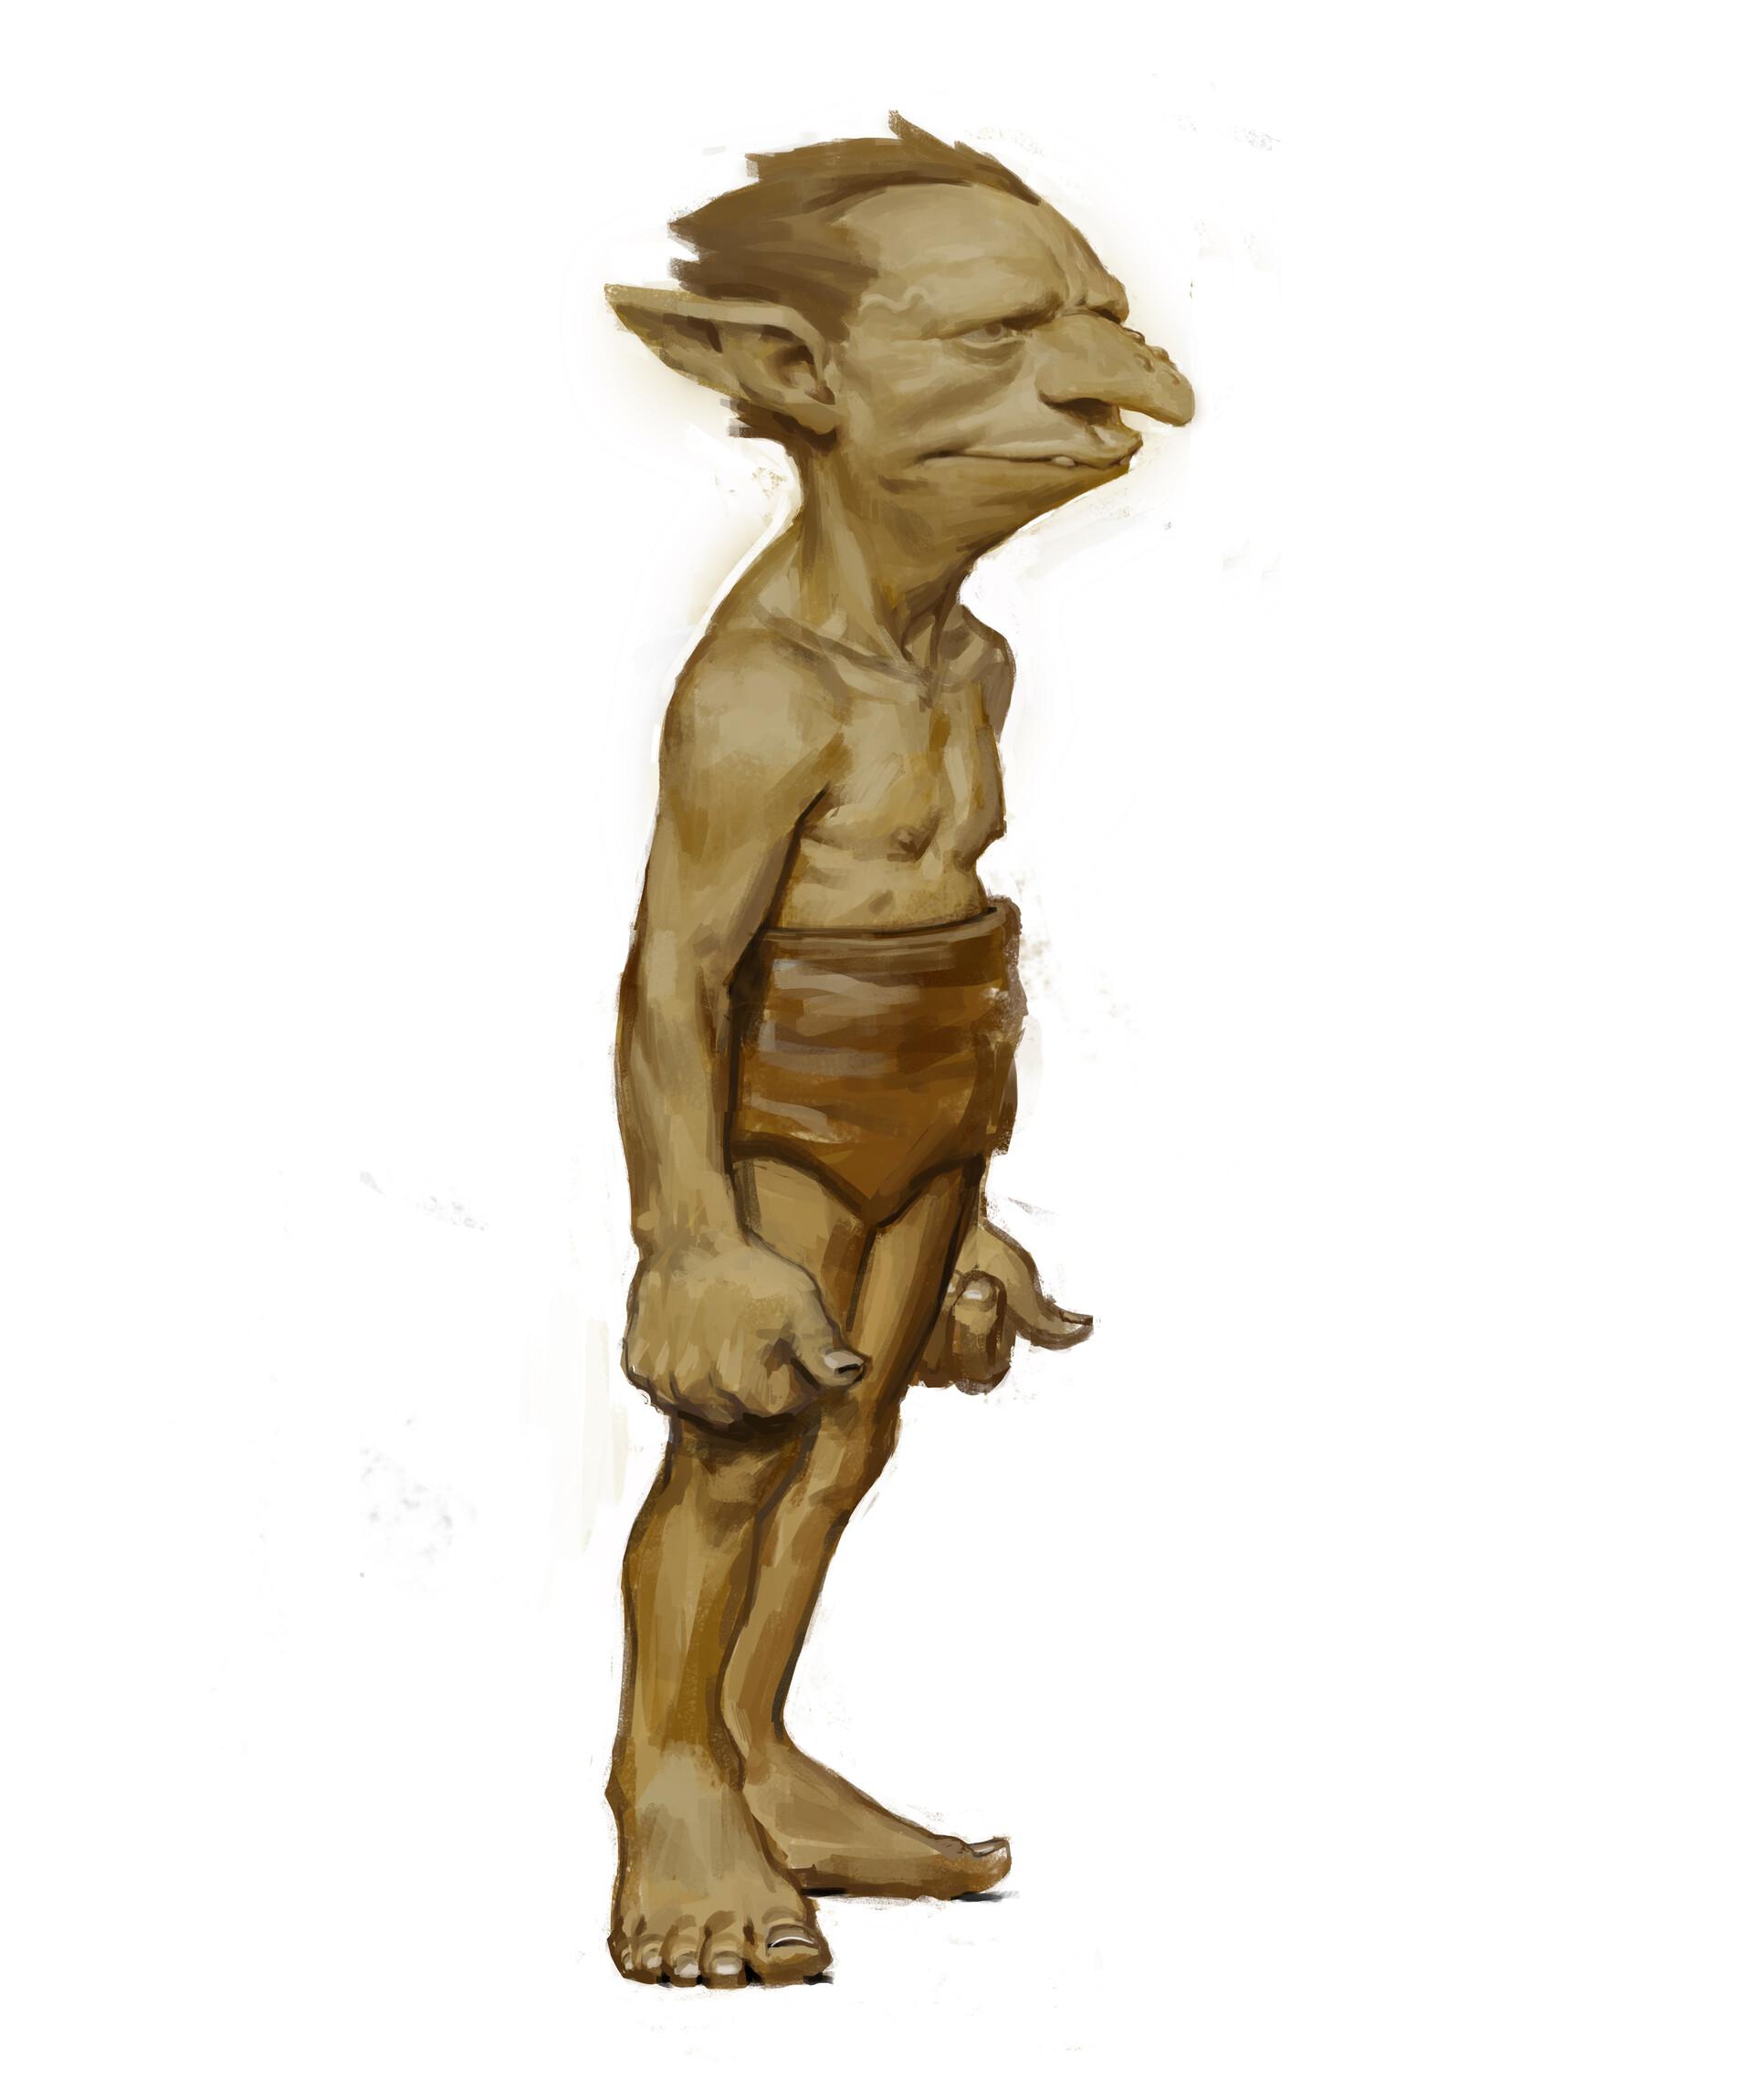 Jens claessens goblin